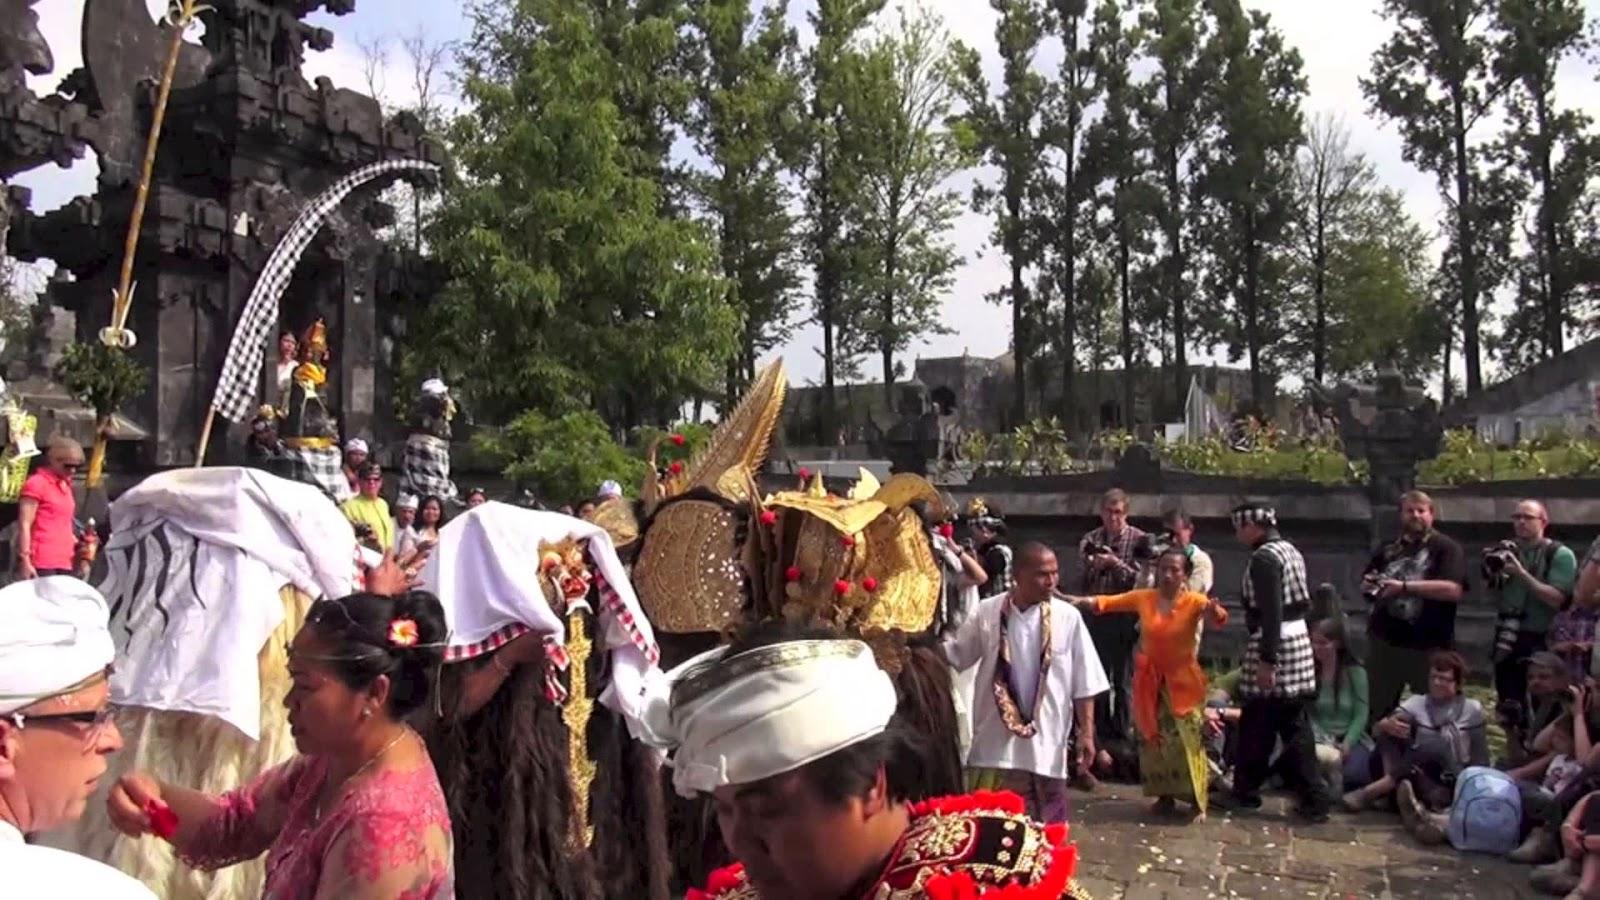 Pura Santi Agung Bhuwana in Belgium, Pura Santi Agung Bhuwana, HIndu temple in Belgium, Pura Hindu in Belgium, Pura Hindu di Belgia, Hindu temple in Belgium